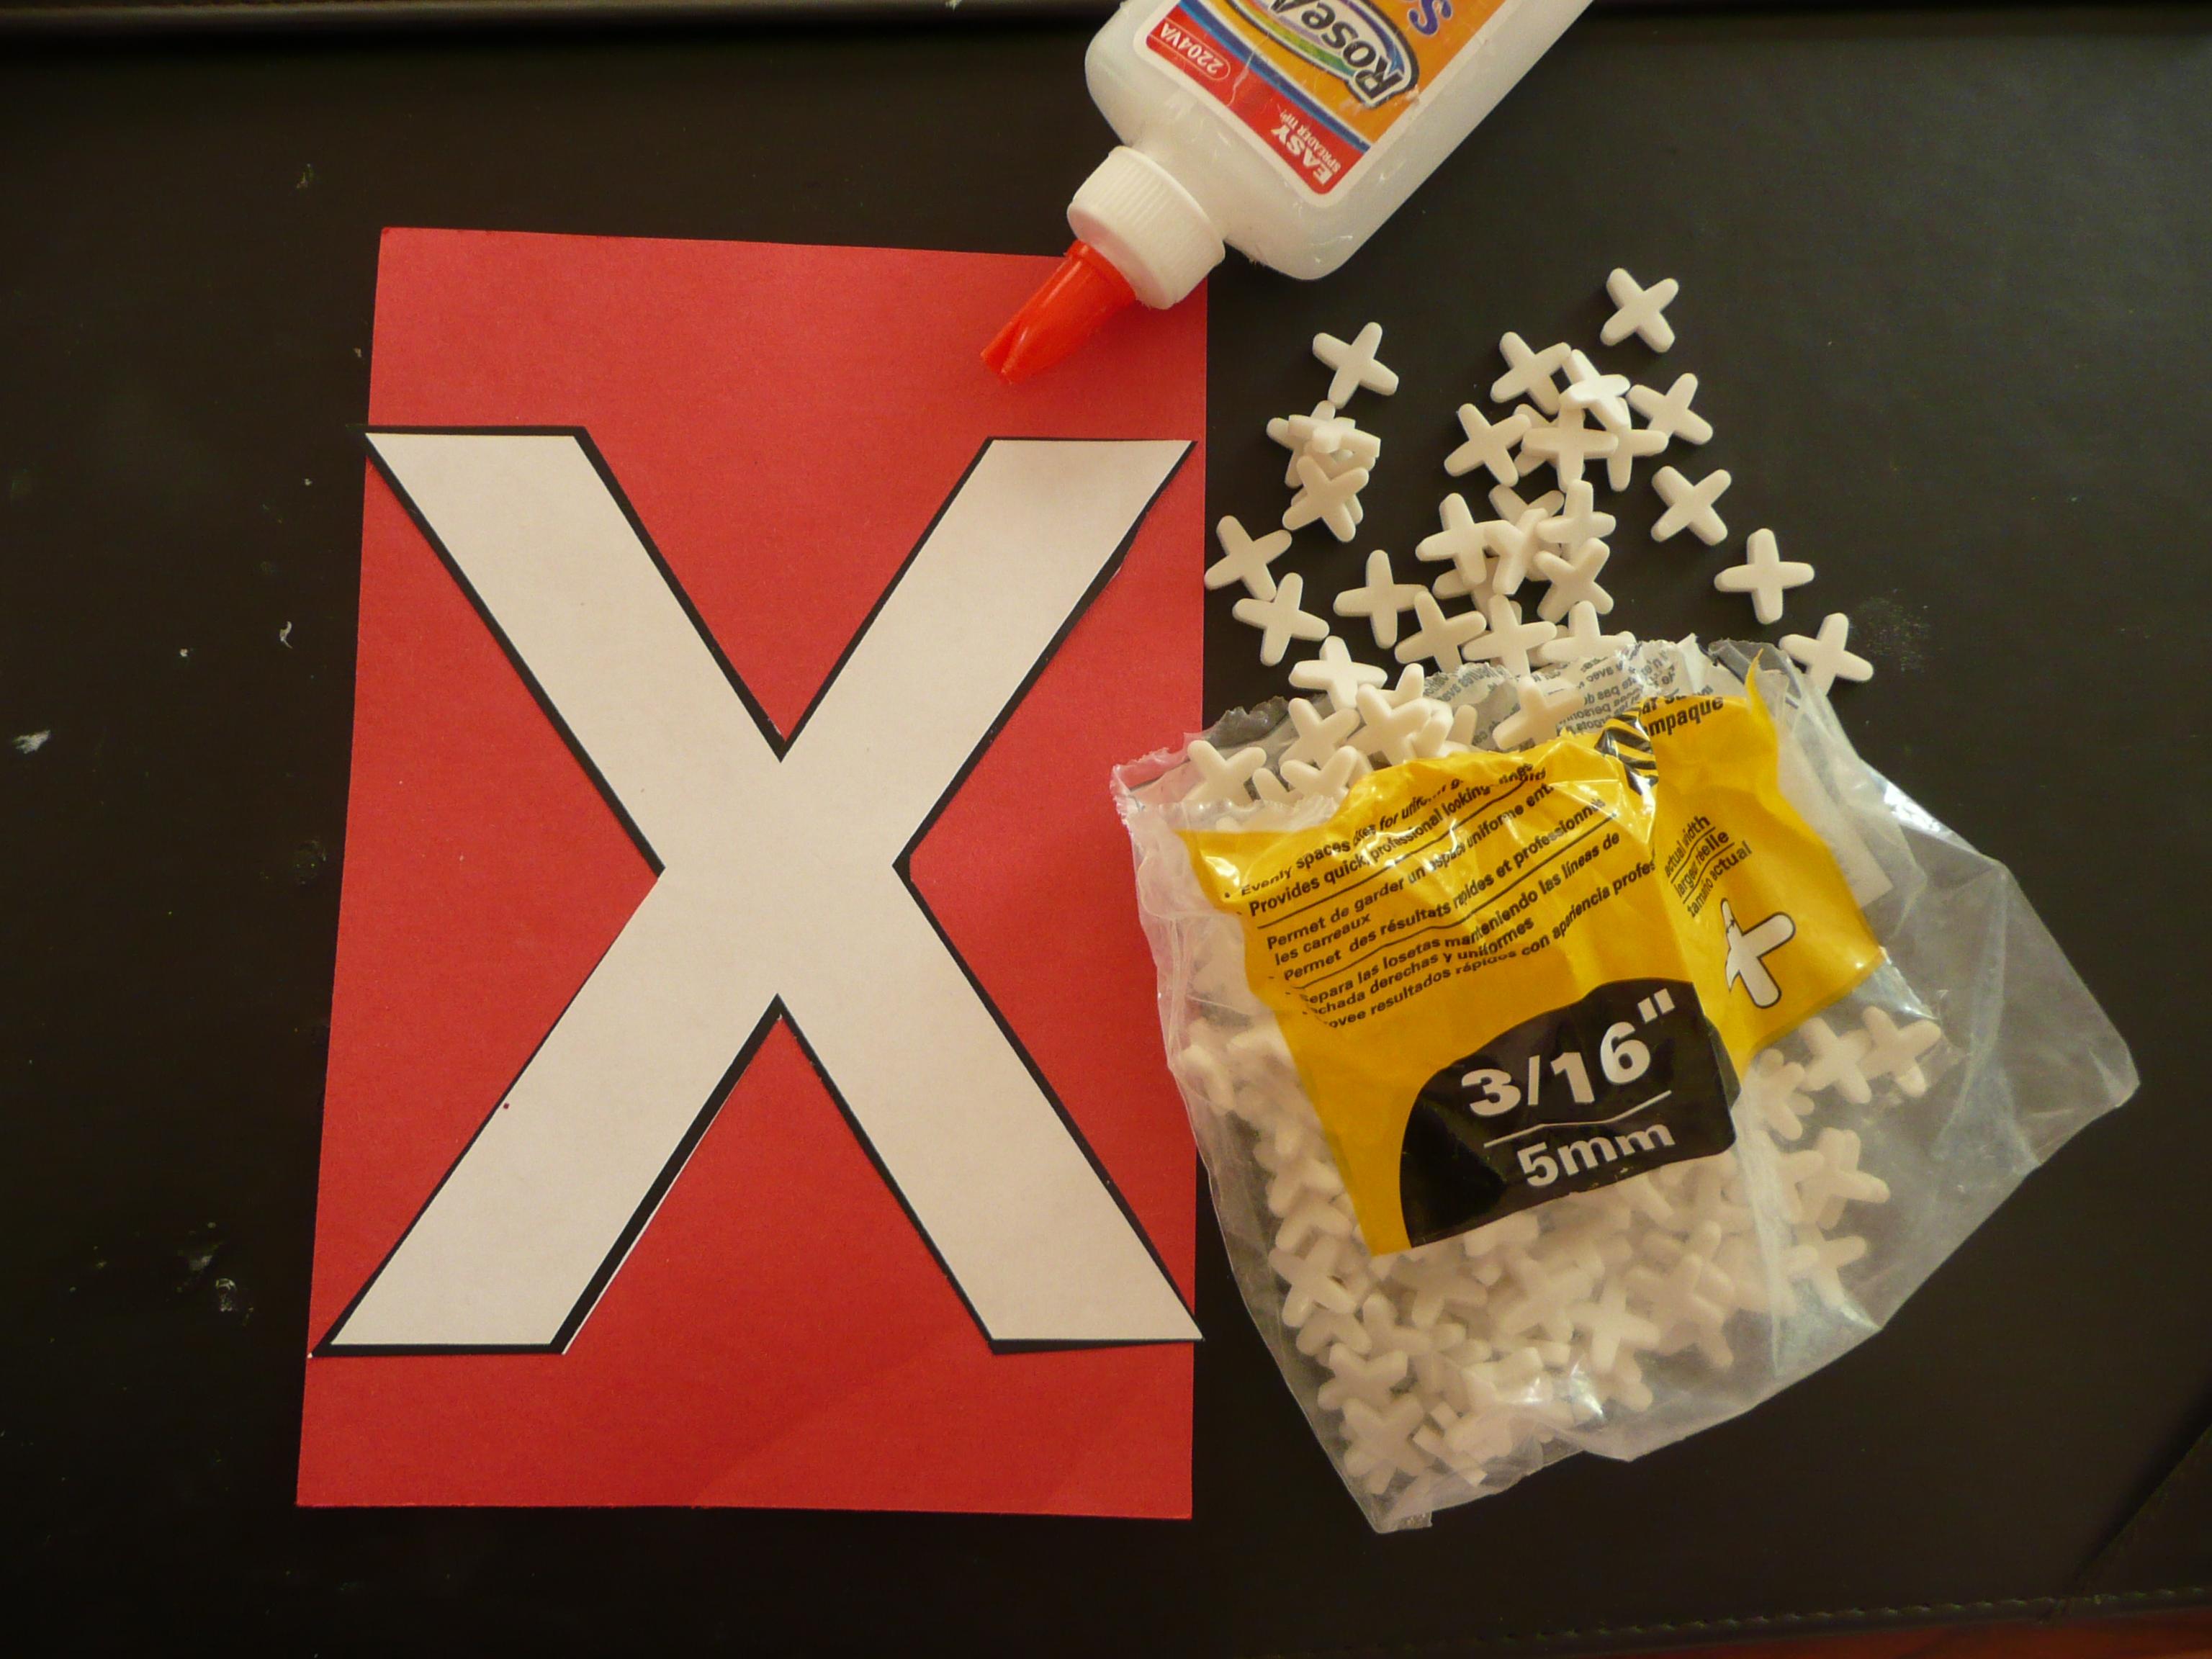 Letter X Crafts For Preschool Letter x crafts...